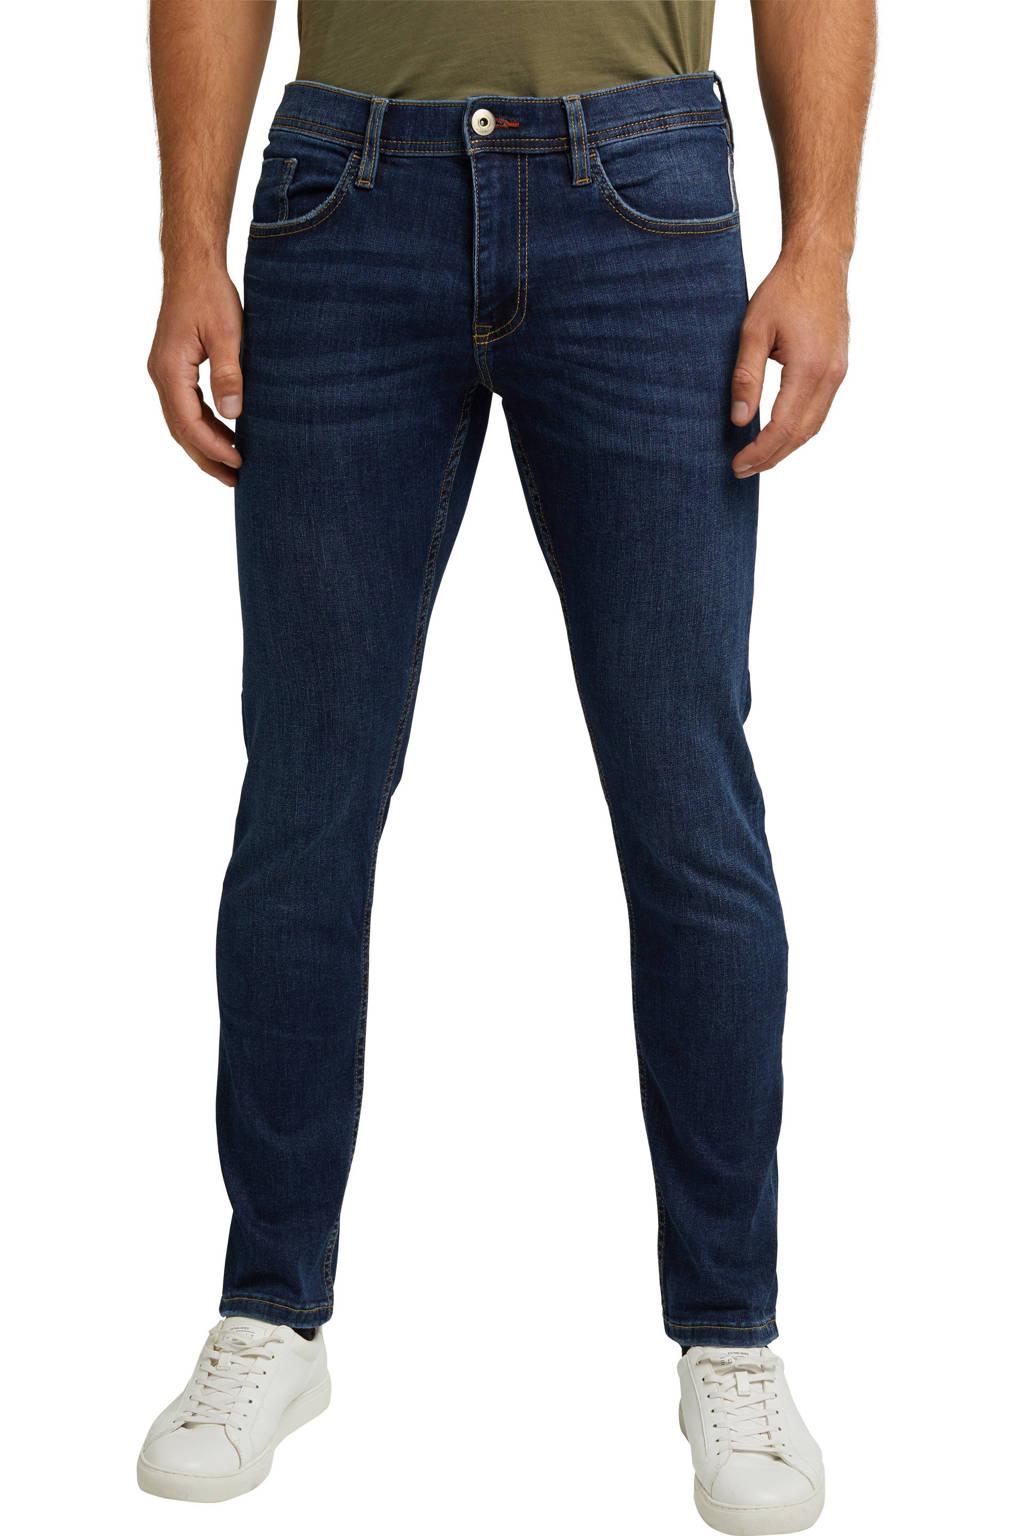 ESPRIT regular fit jeans dark denim, Dark denim